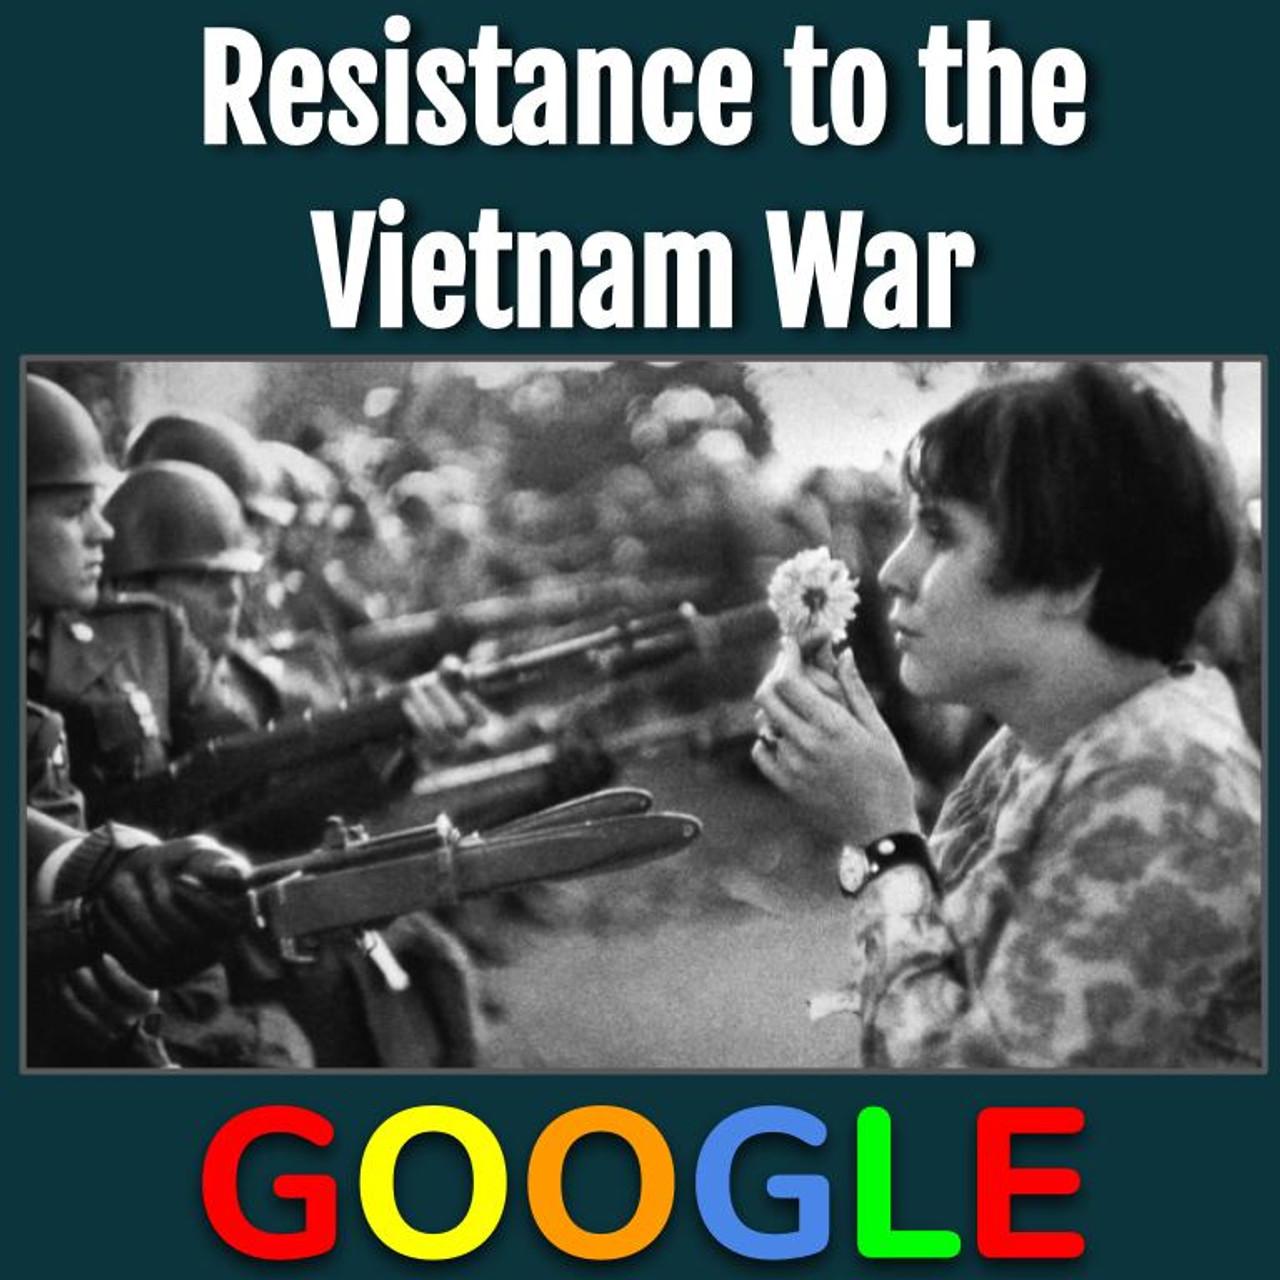 Informational Text: Resistance to the Vietnam War